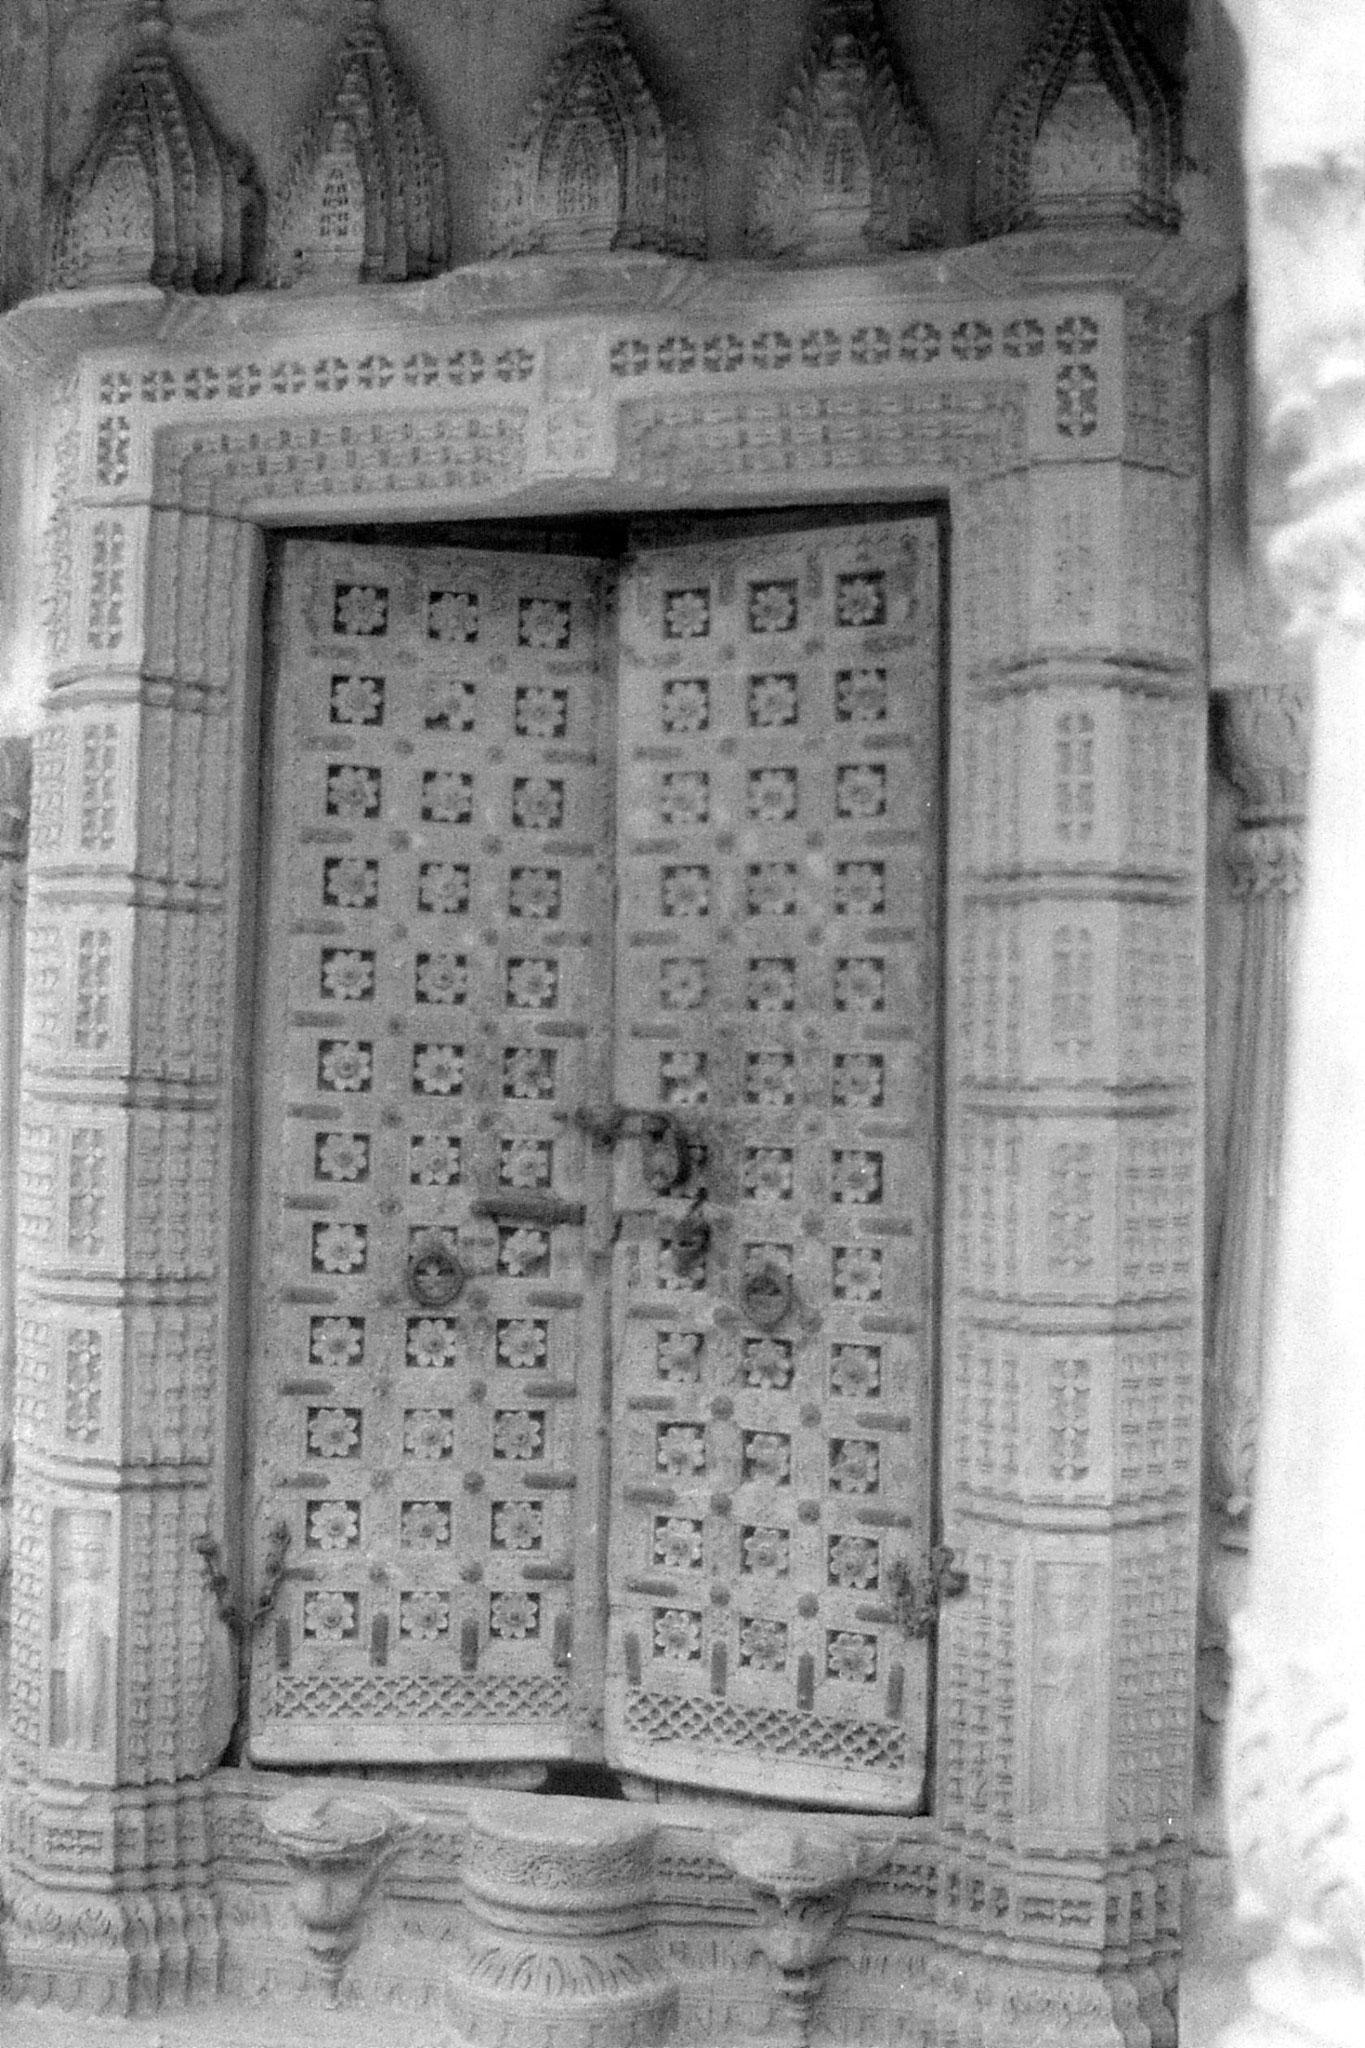 1/12/1989: 4: Jaisalmer, Ghadiser Tank doorway